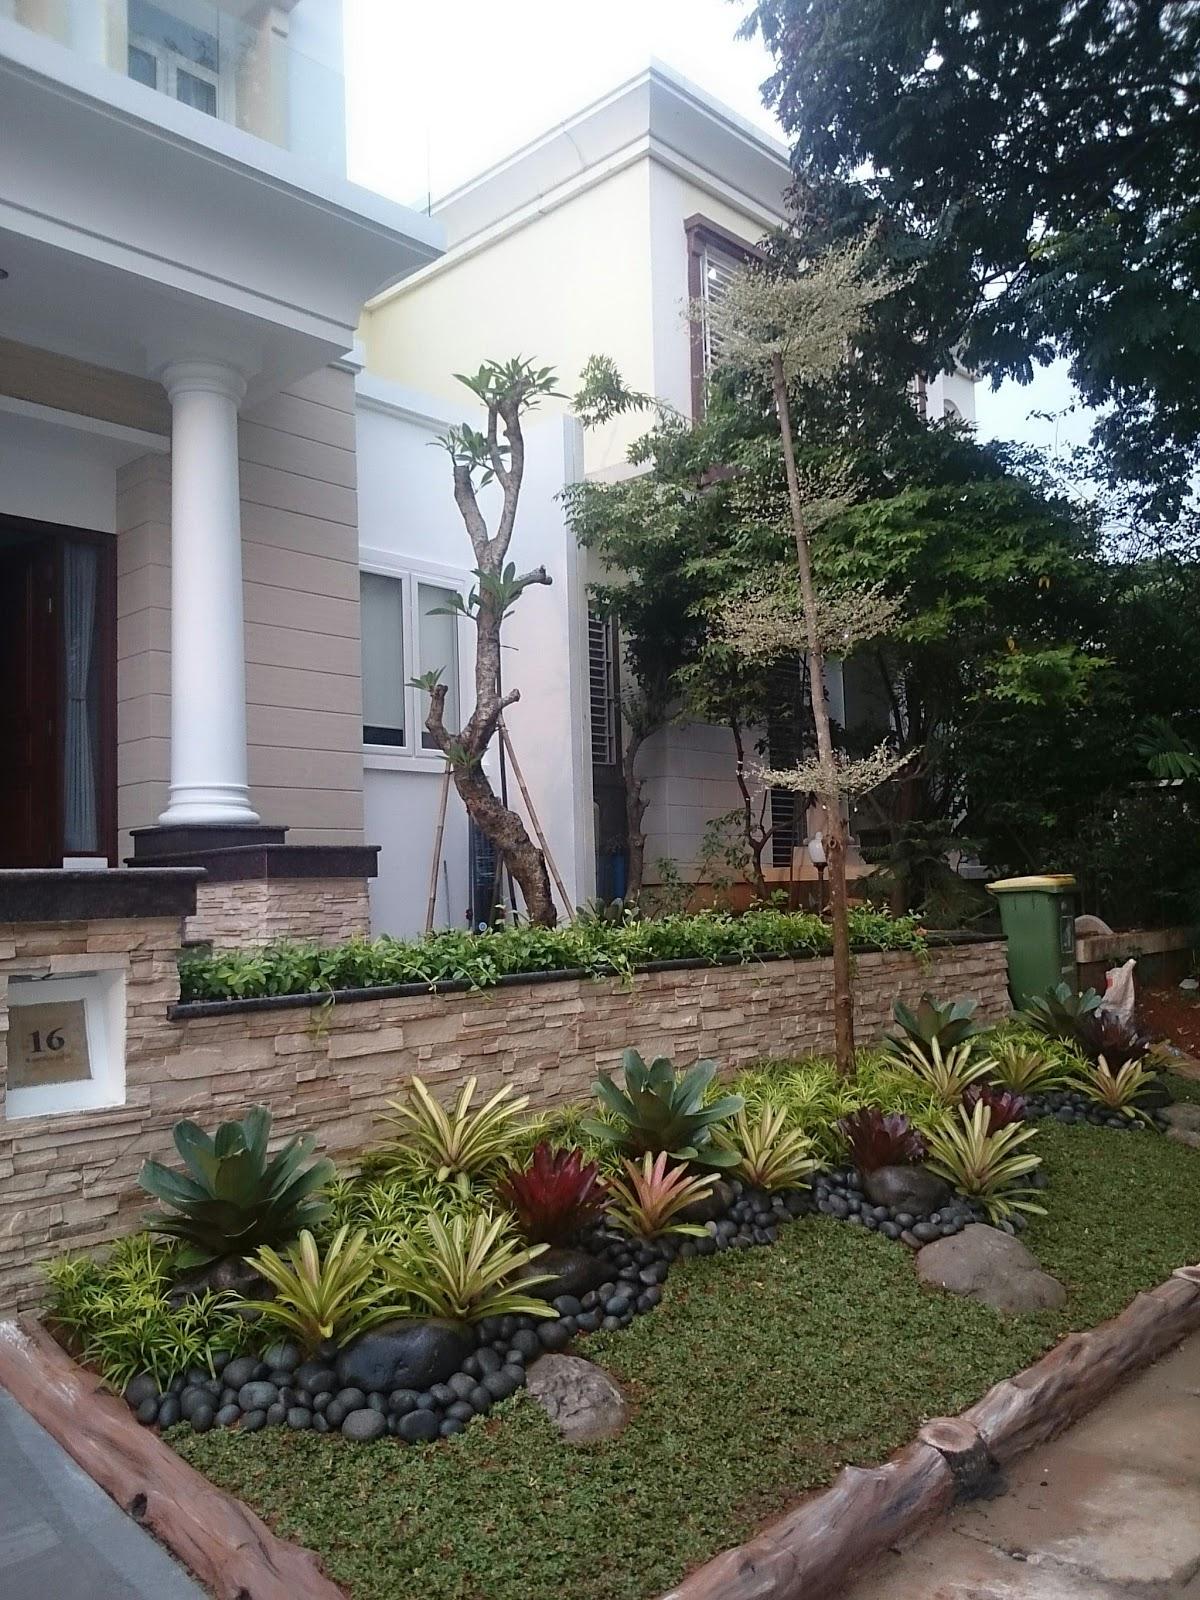 DESAIN TAMAN JAKARTA | TUKANG TAMAN JAKARTA | Jasa Taman Tangerang | Taman  Minimalis